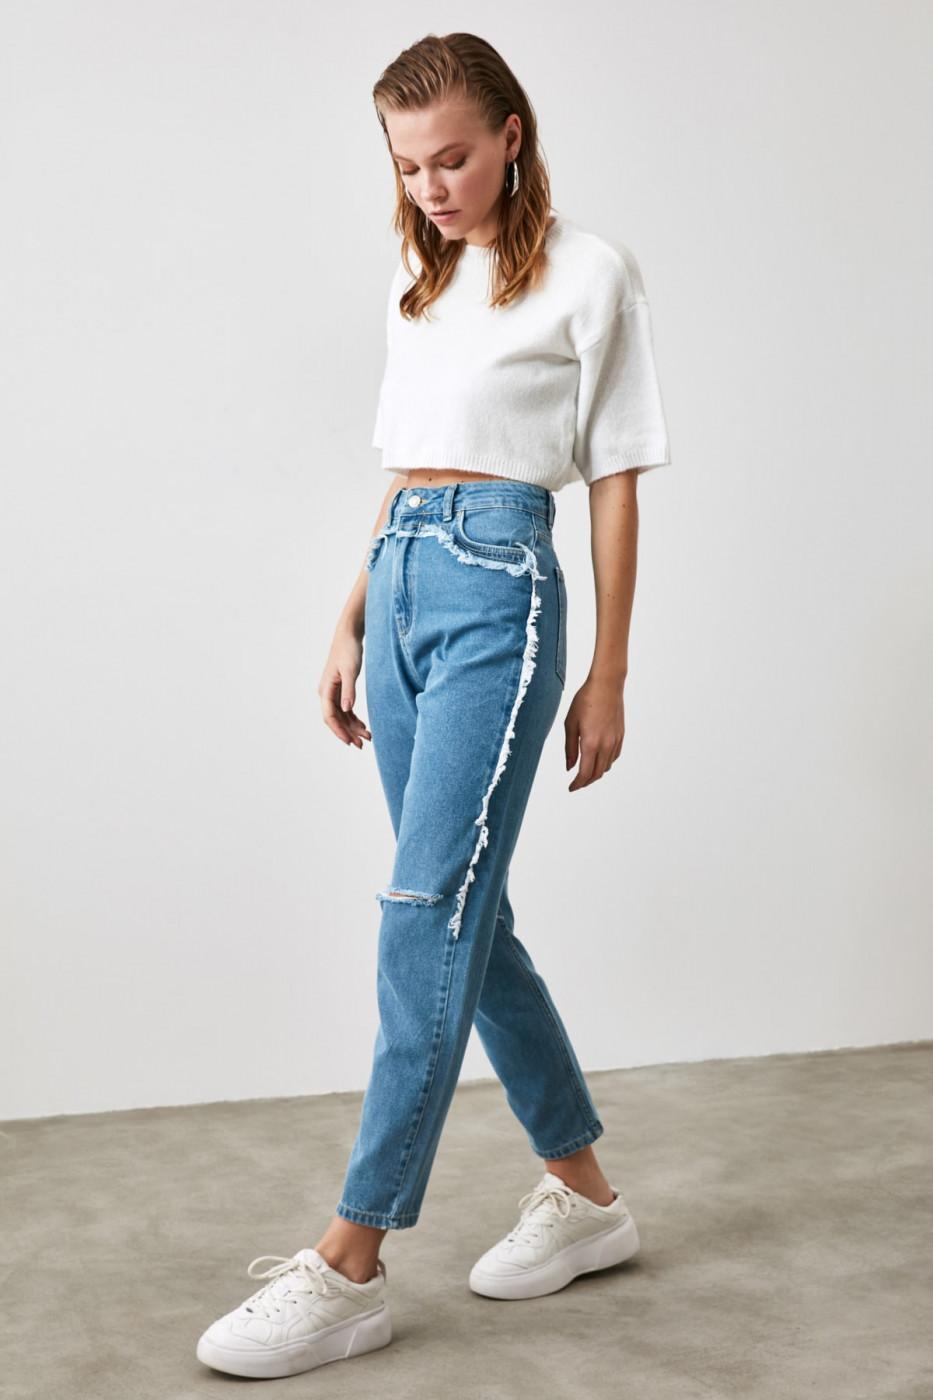 Trendyol Indigo Ripped Tassel Detailed High Waist Mom Jeans